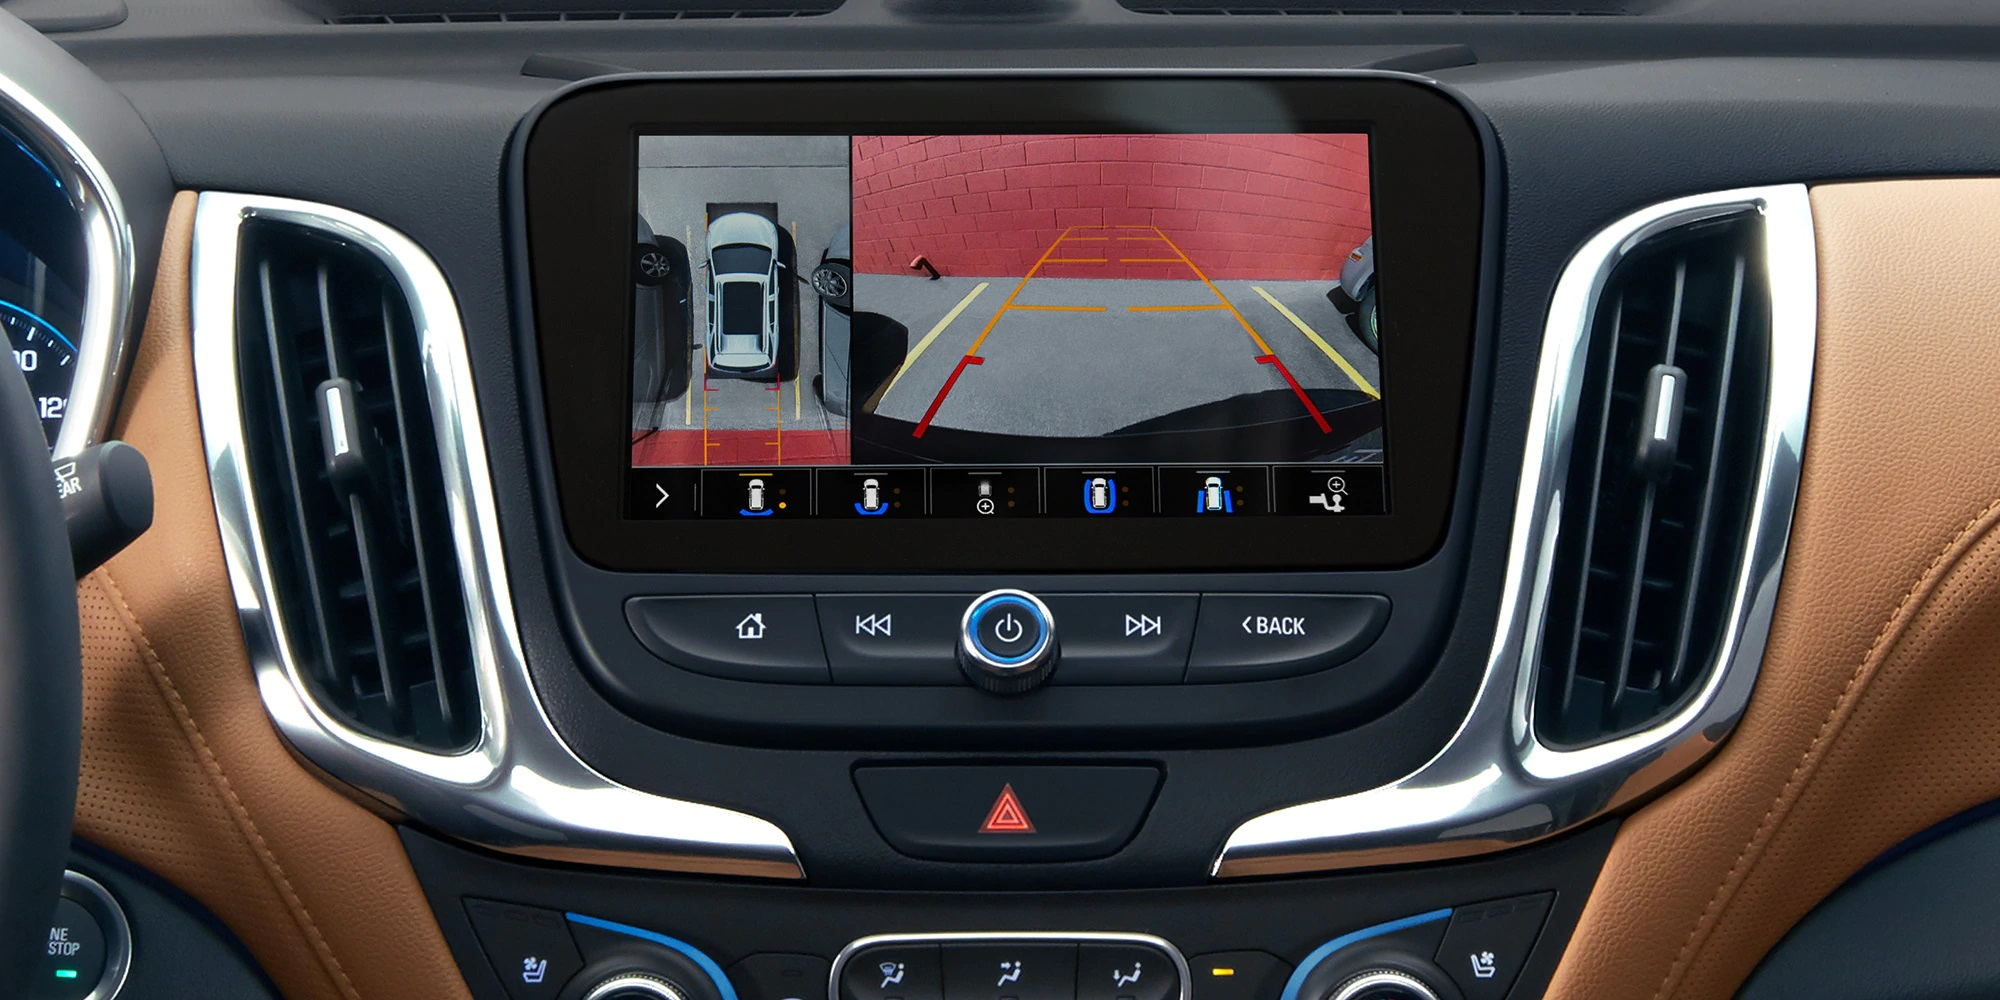 2020 Chevrolet Equinox Backup Camera